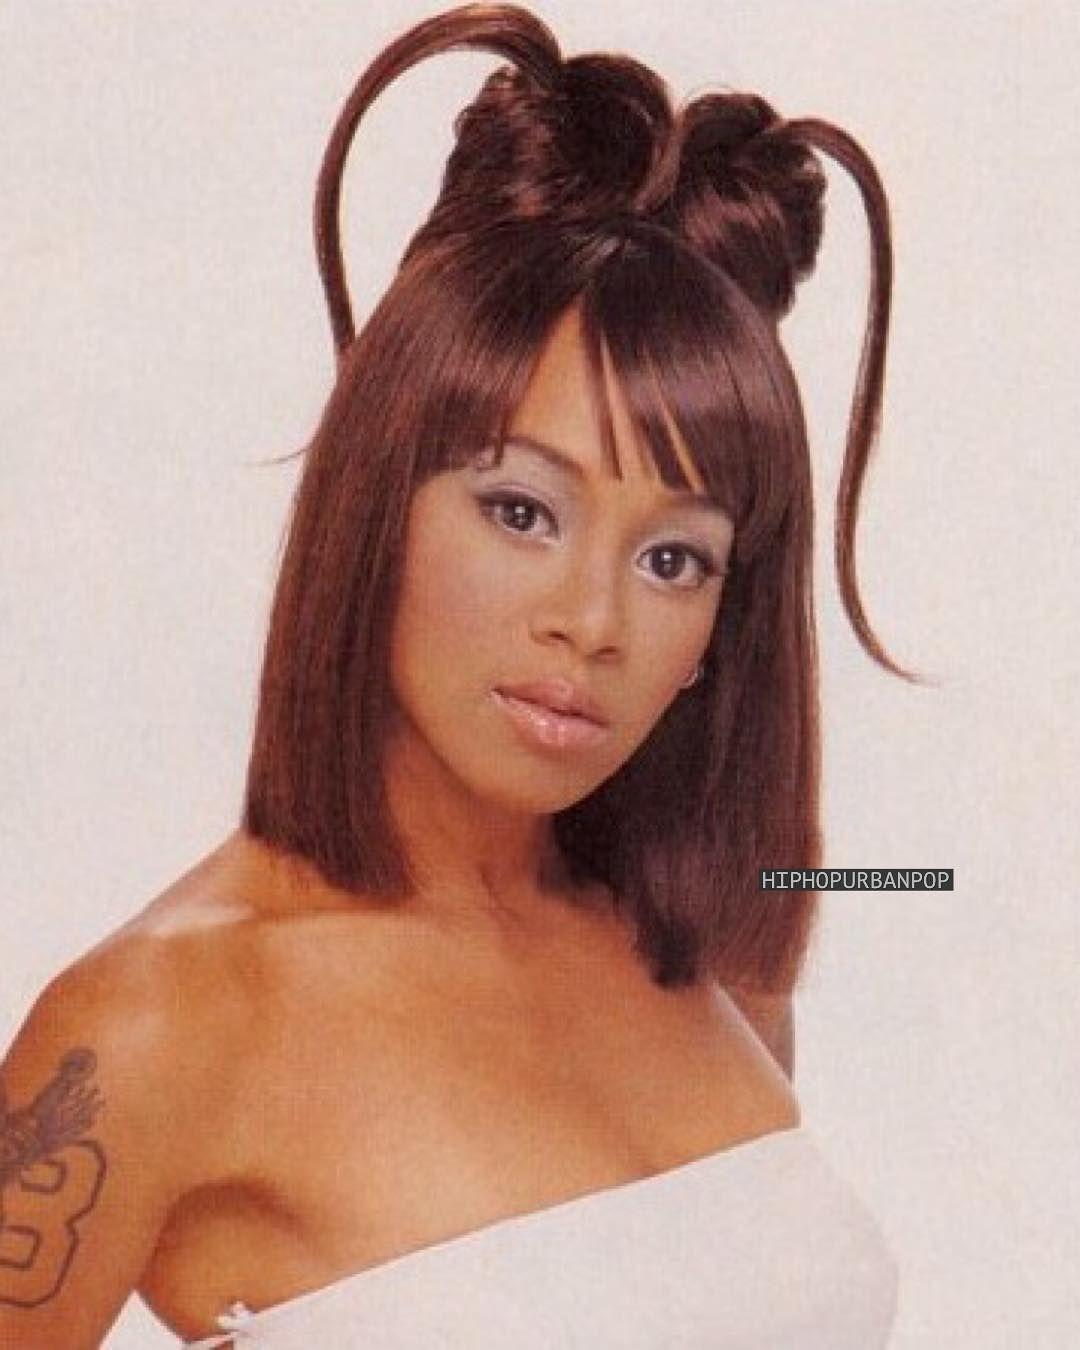 The Vault Circa 90s 00s On Instagram Left Eye In Black Hair Magazine 1999 Lefteye Black Hair Magazine Black Hair 90s Hair Magazine